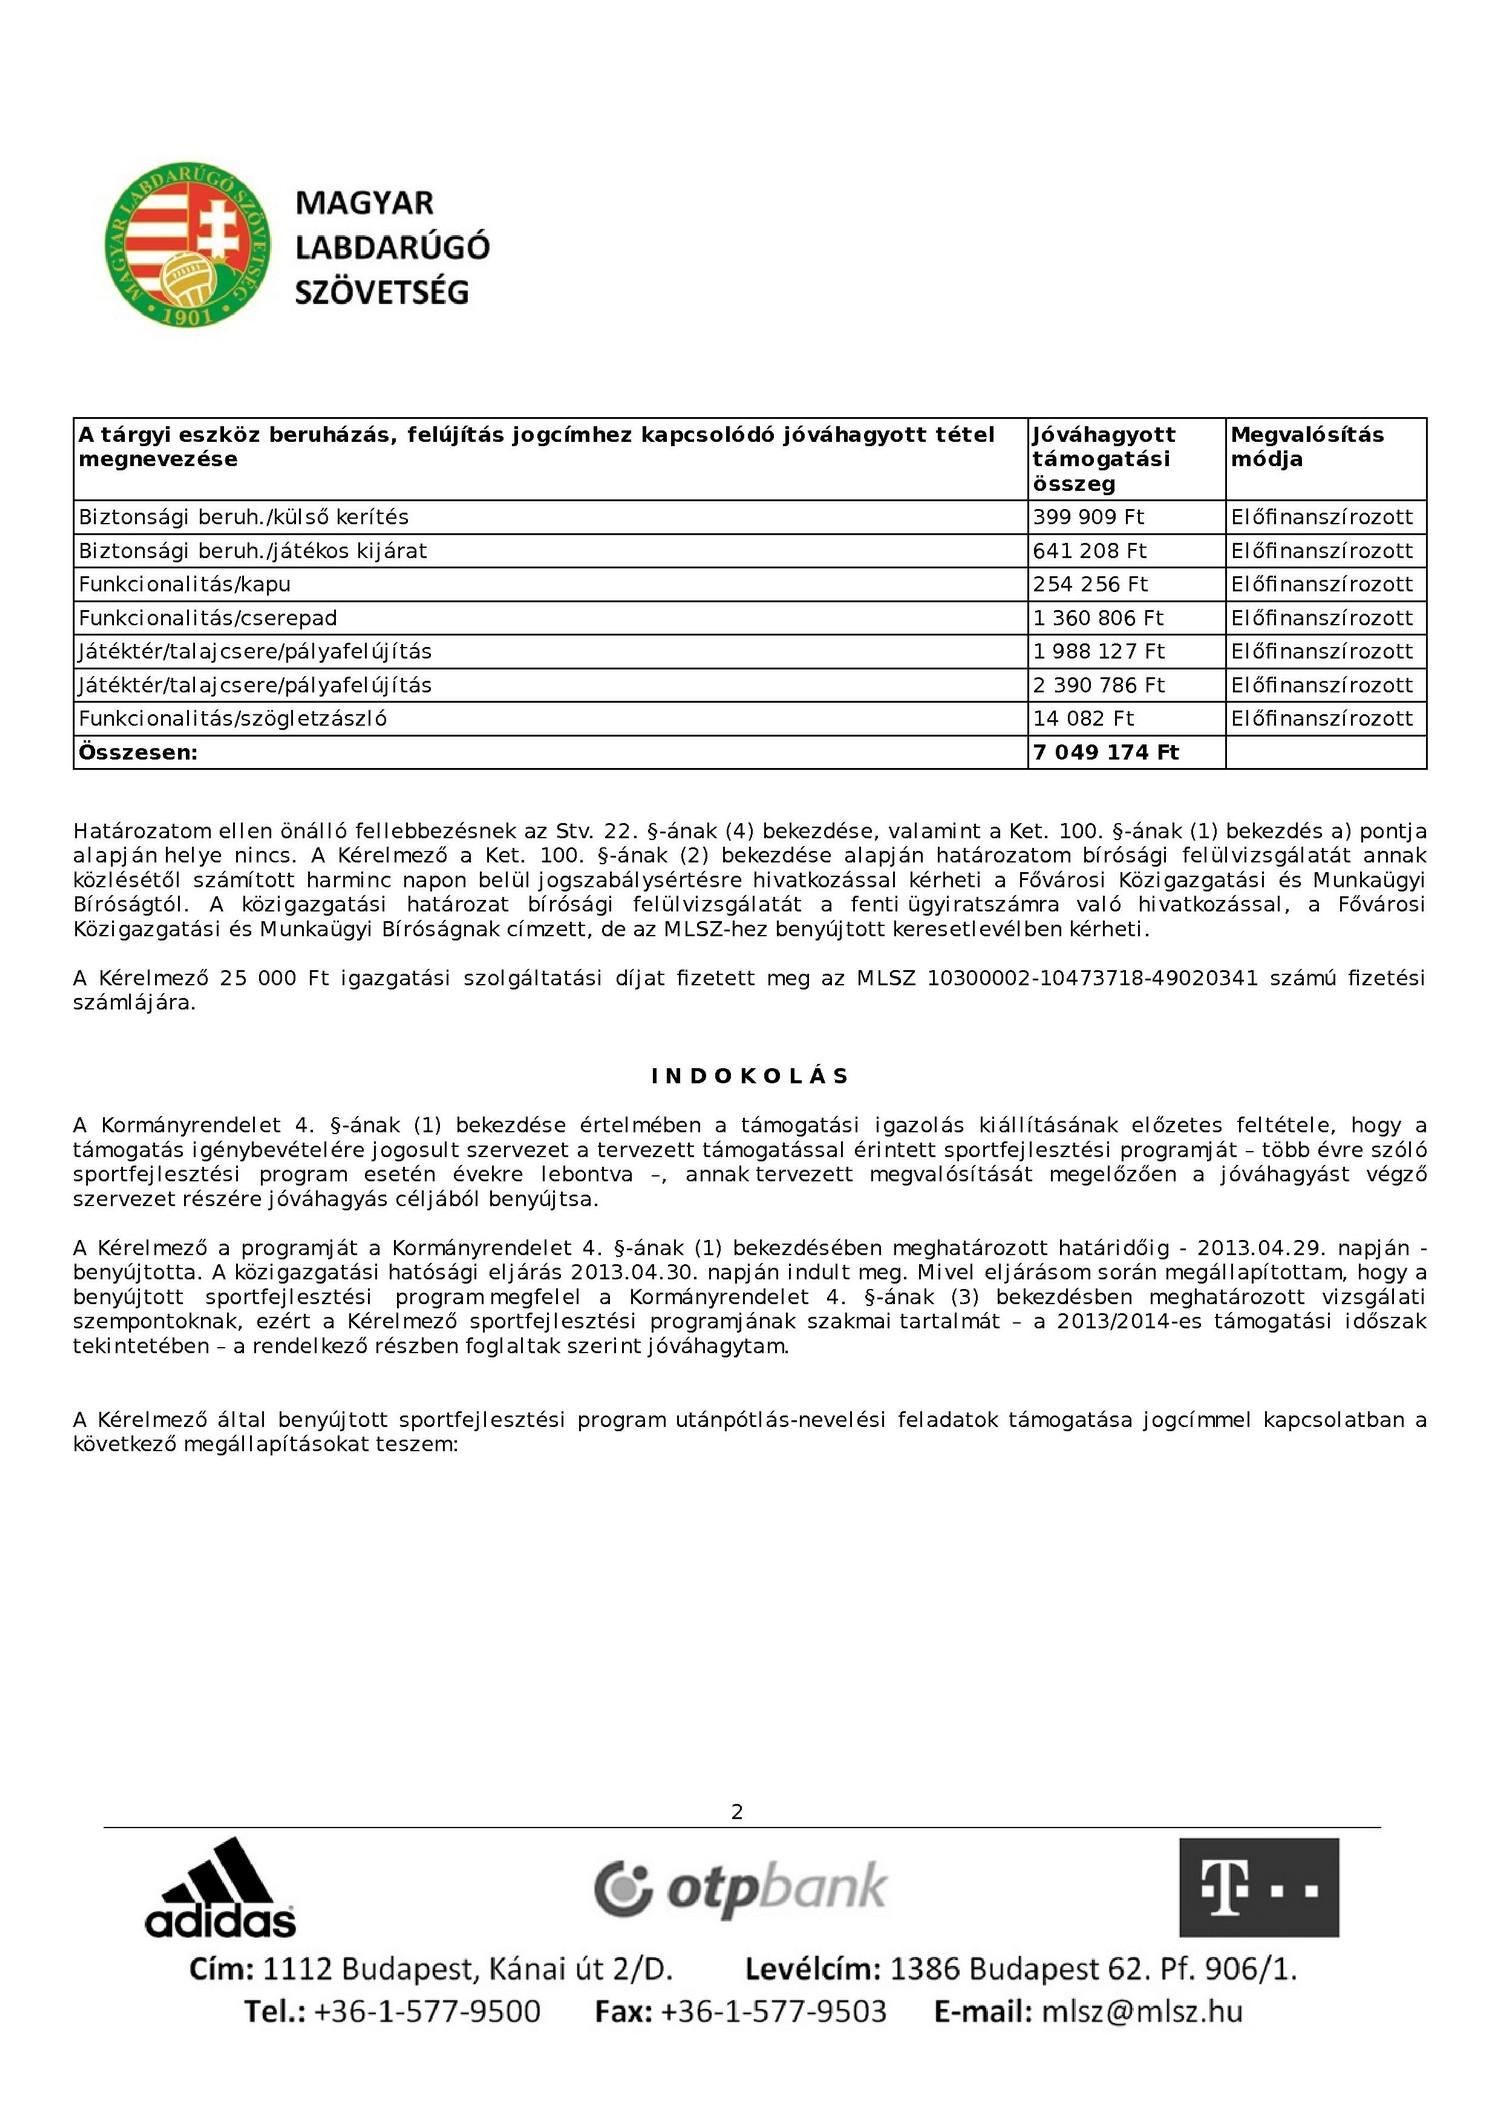 SFPHAT_3915_1_20131031_SIGNED-2